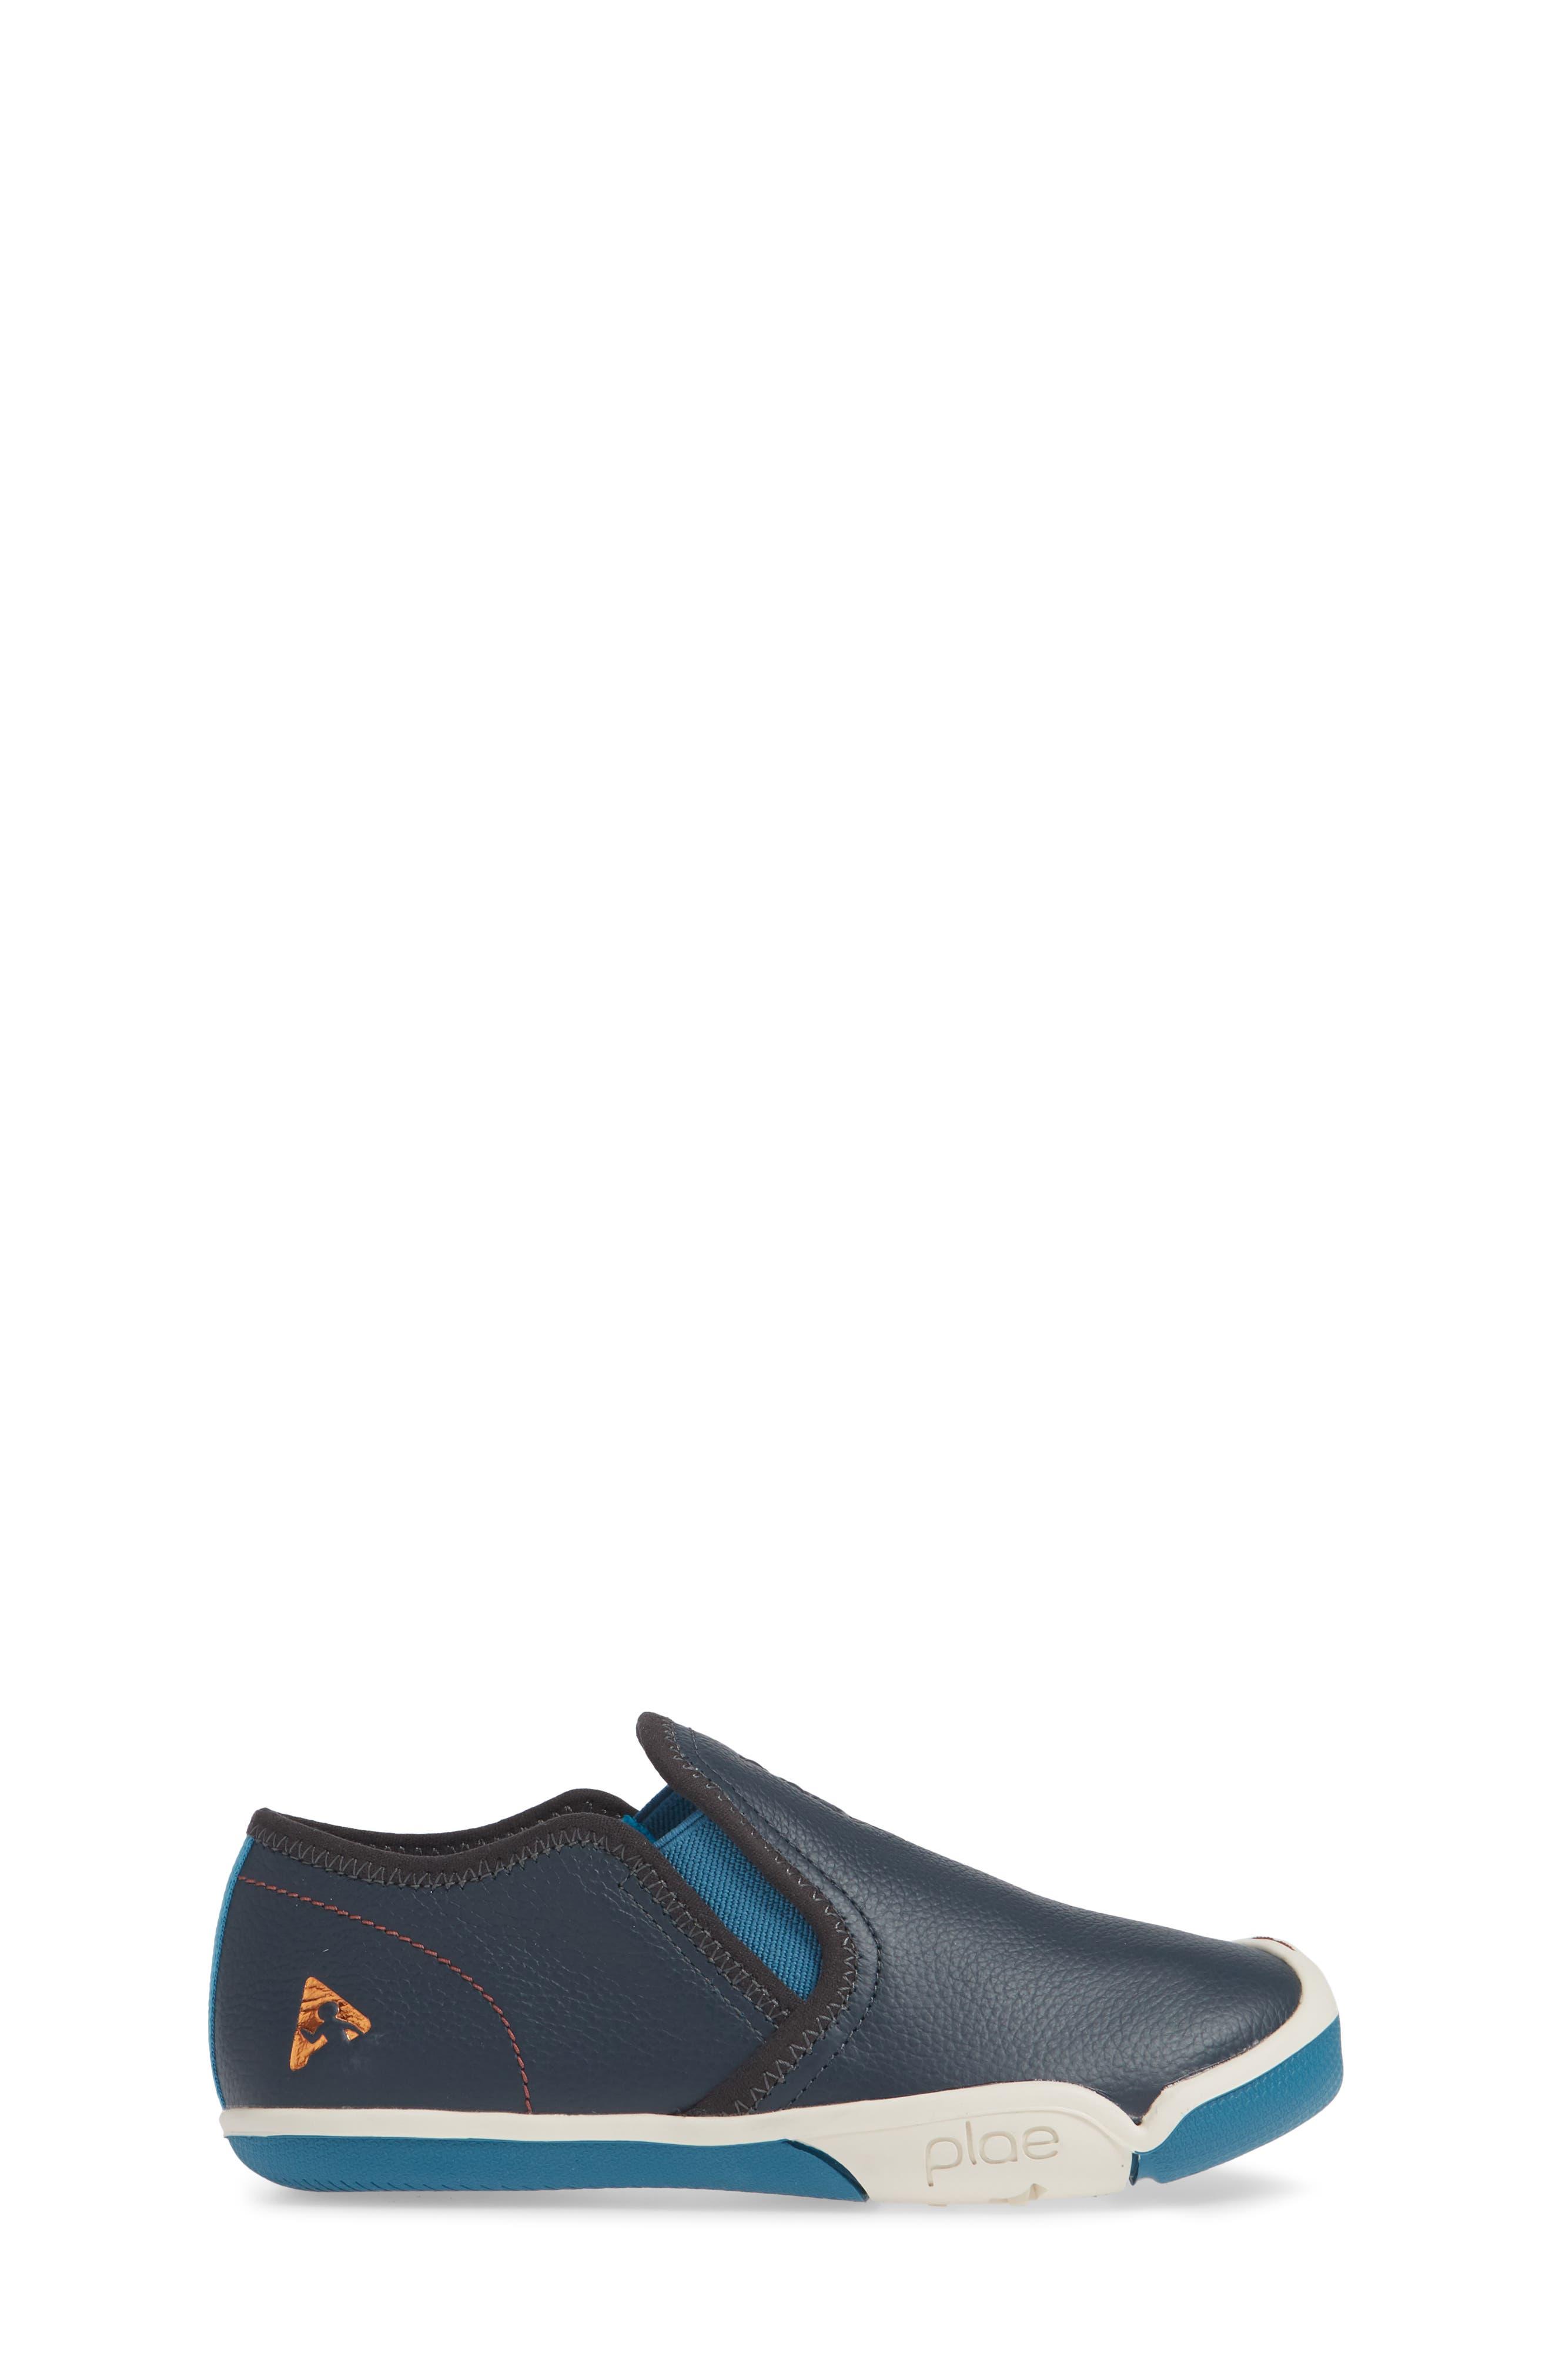 Migi Slip-On Sneaker,                             Alternate thumbnail 6, color,                             Octo Ink